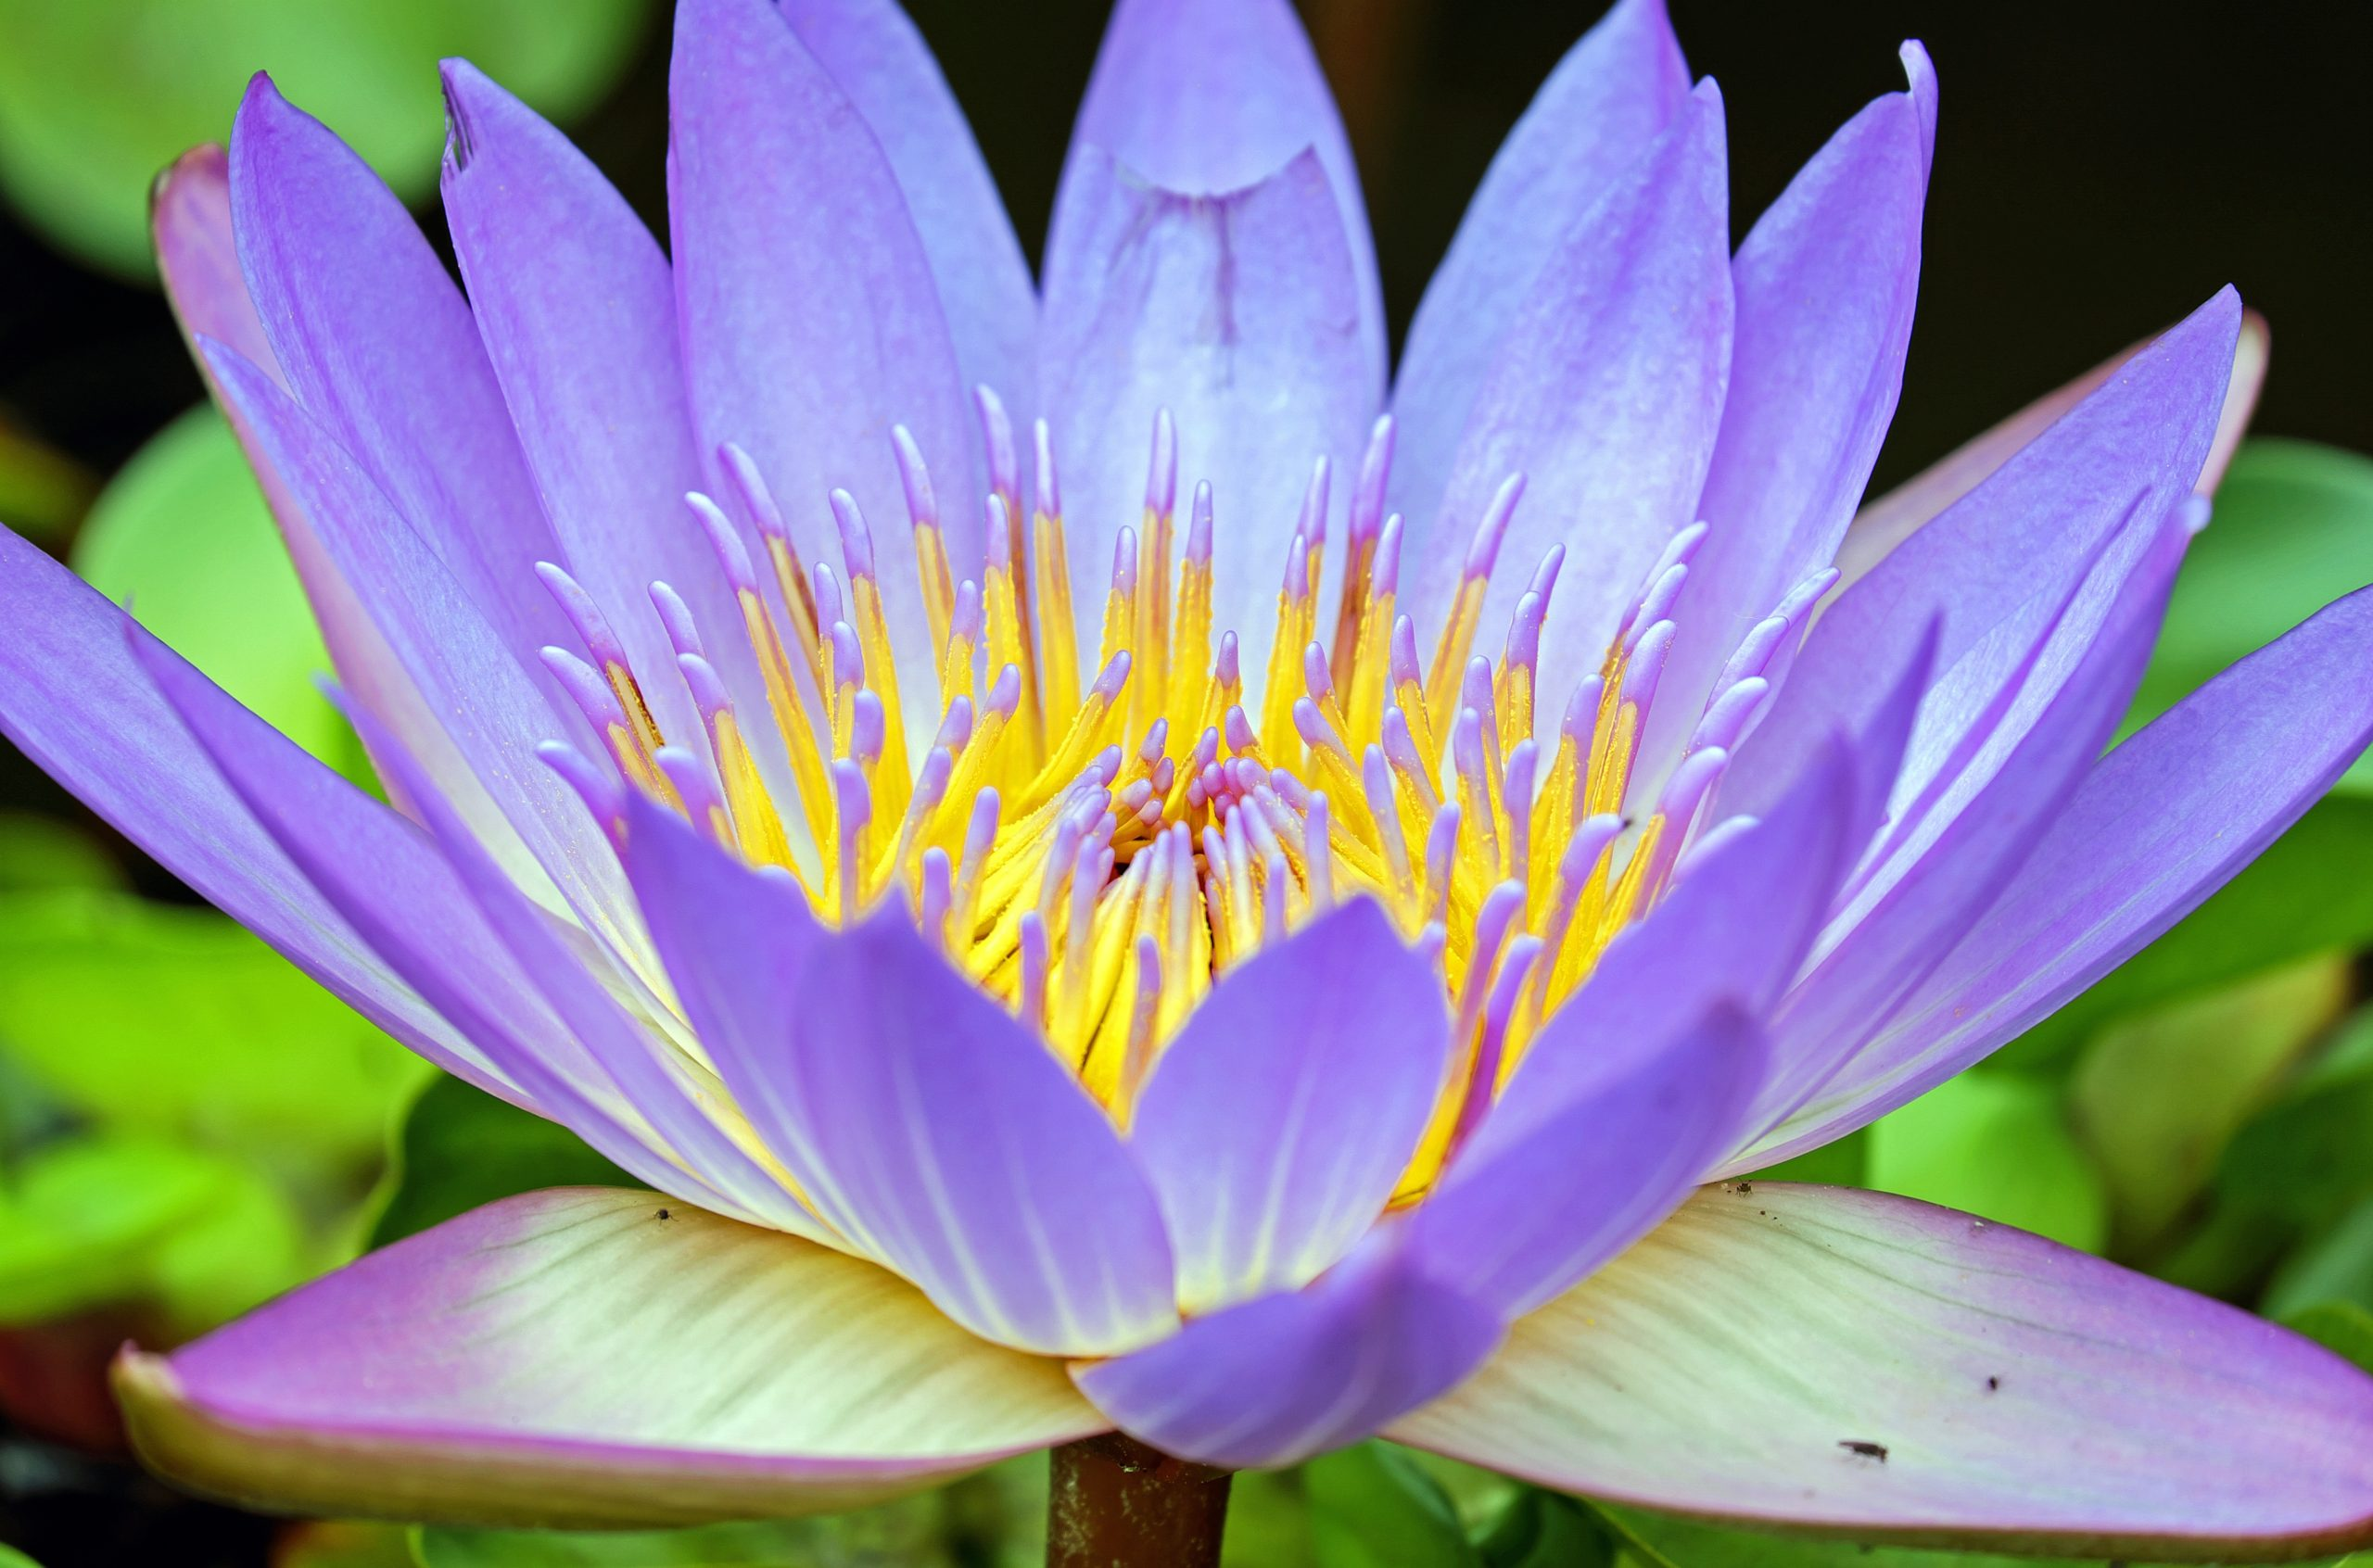 blossom-plant-photography-flower-purple-petal-567862-pxhere.com